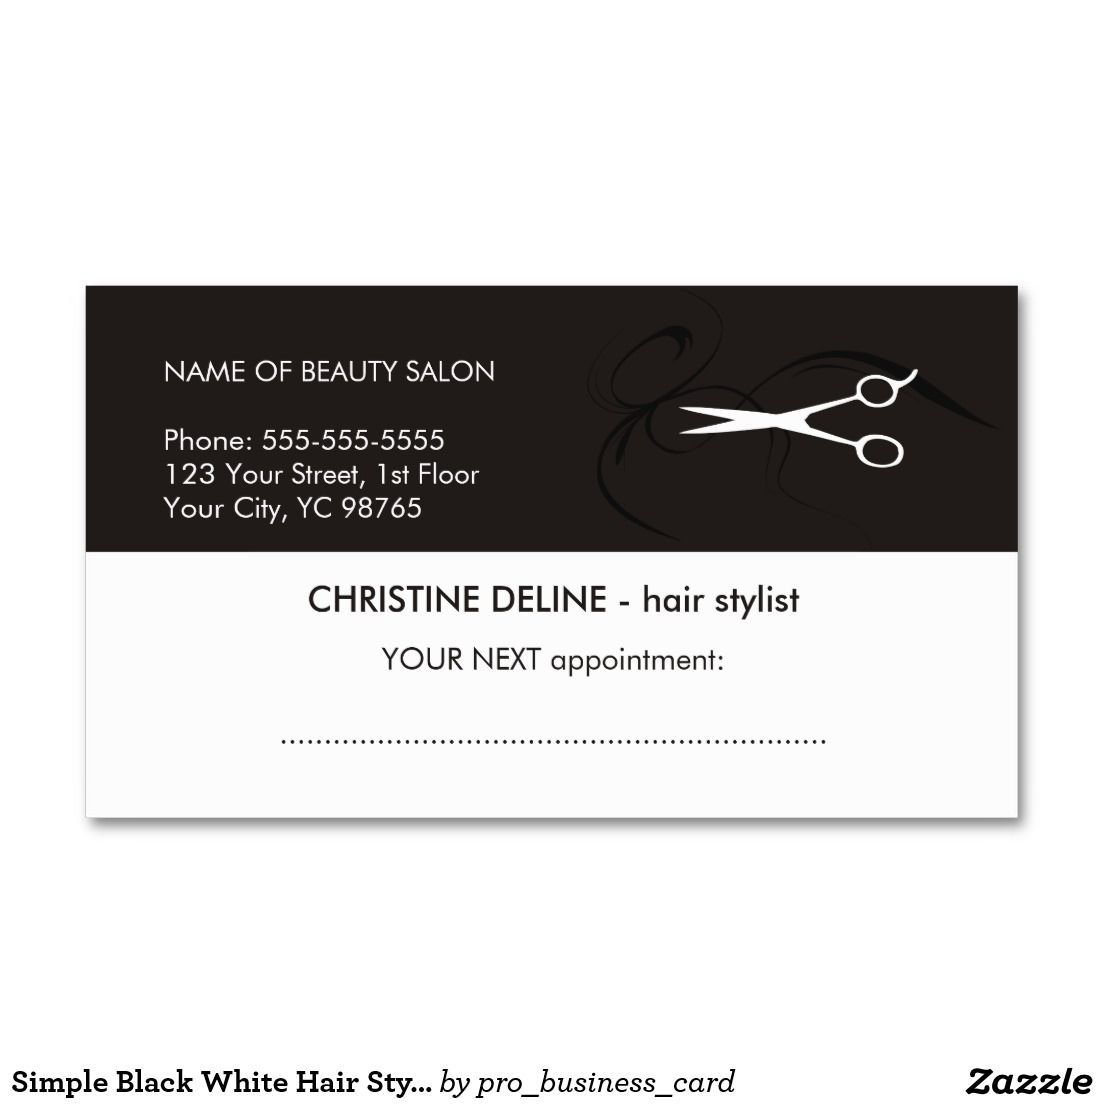 Simple Black White Hair Stylist Appointment Card | Black white hair ...